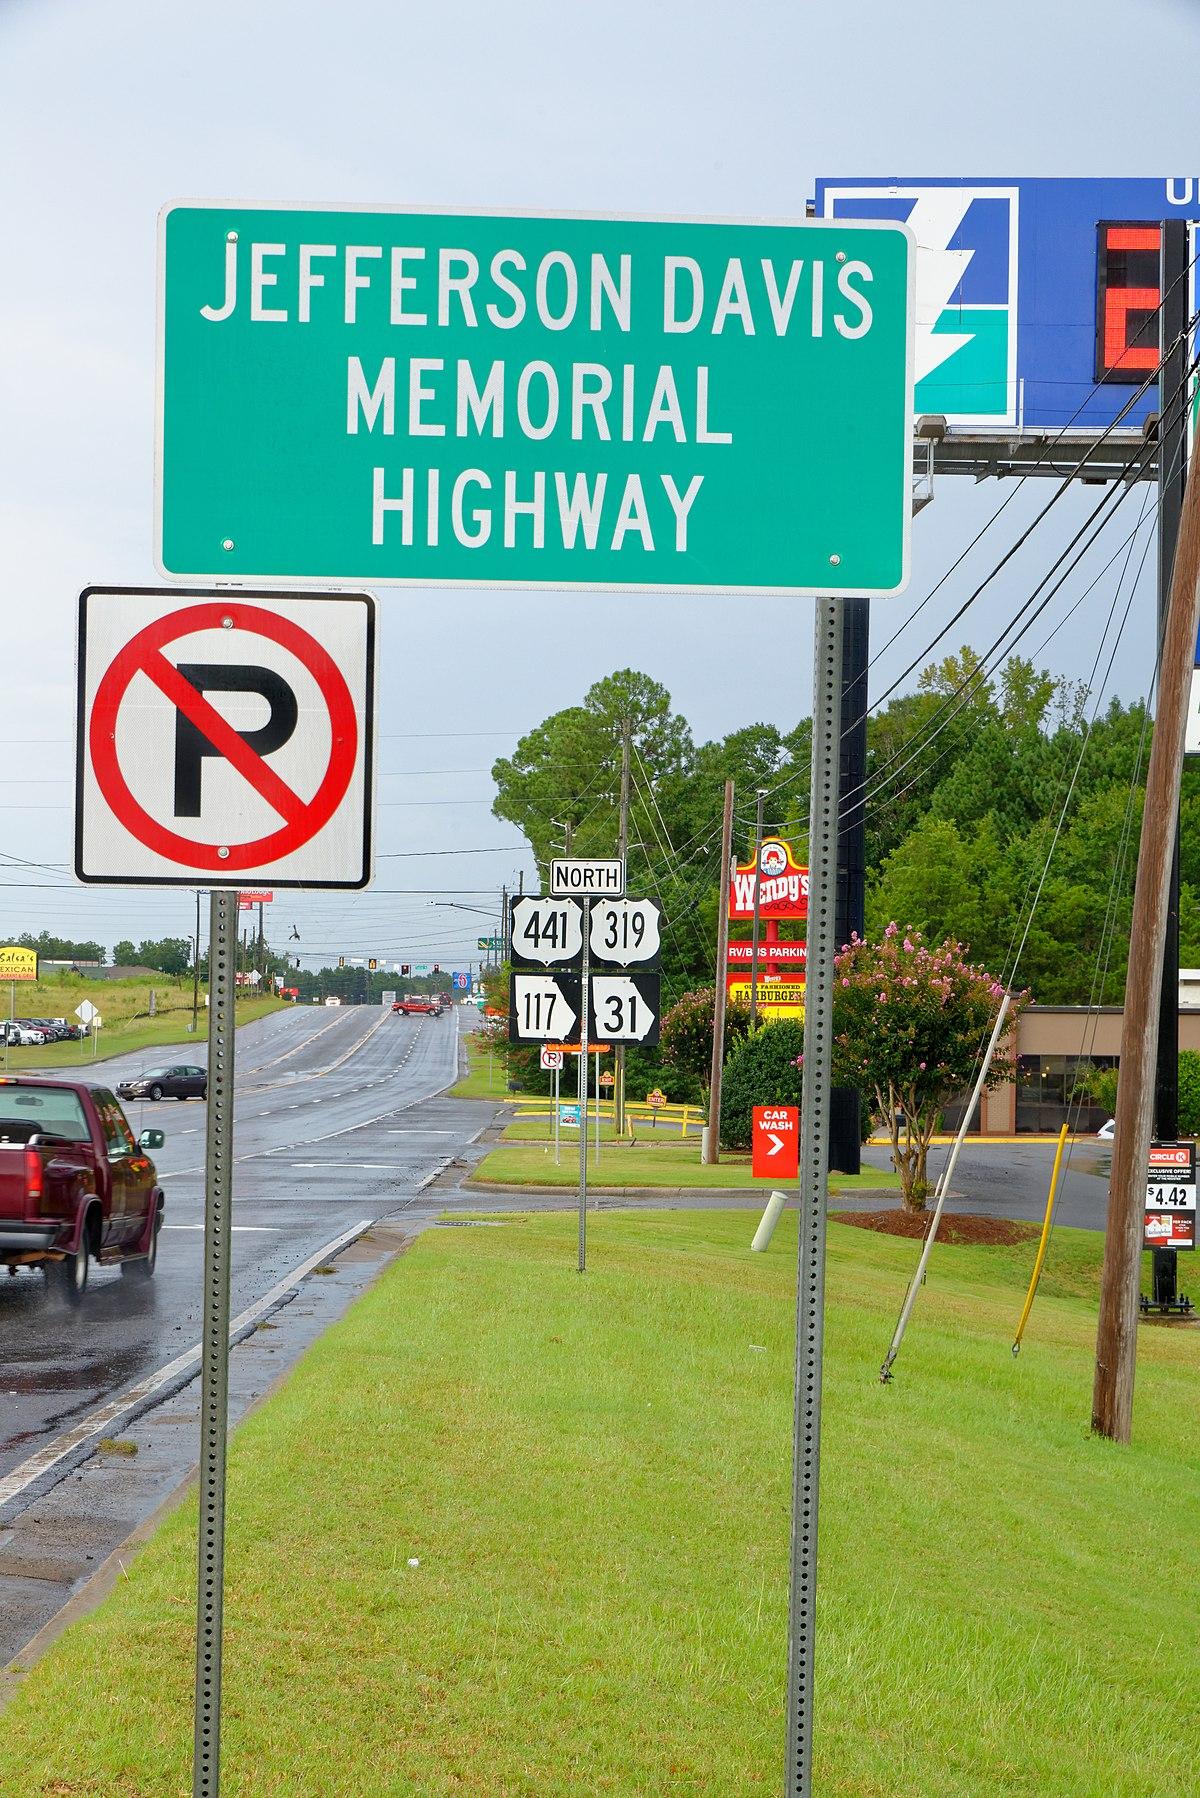 West End Auto >> Jefferson Davis Highway - Wikipedia